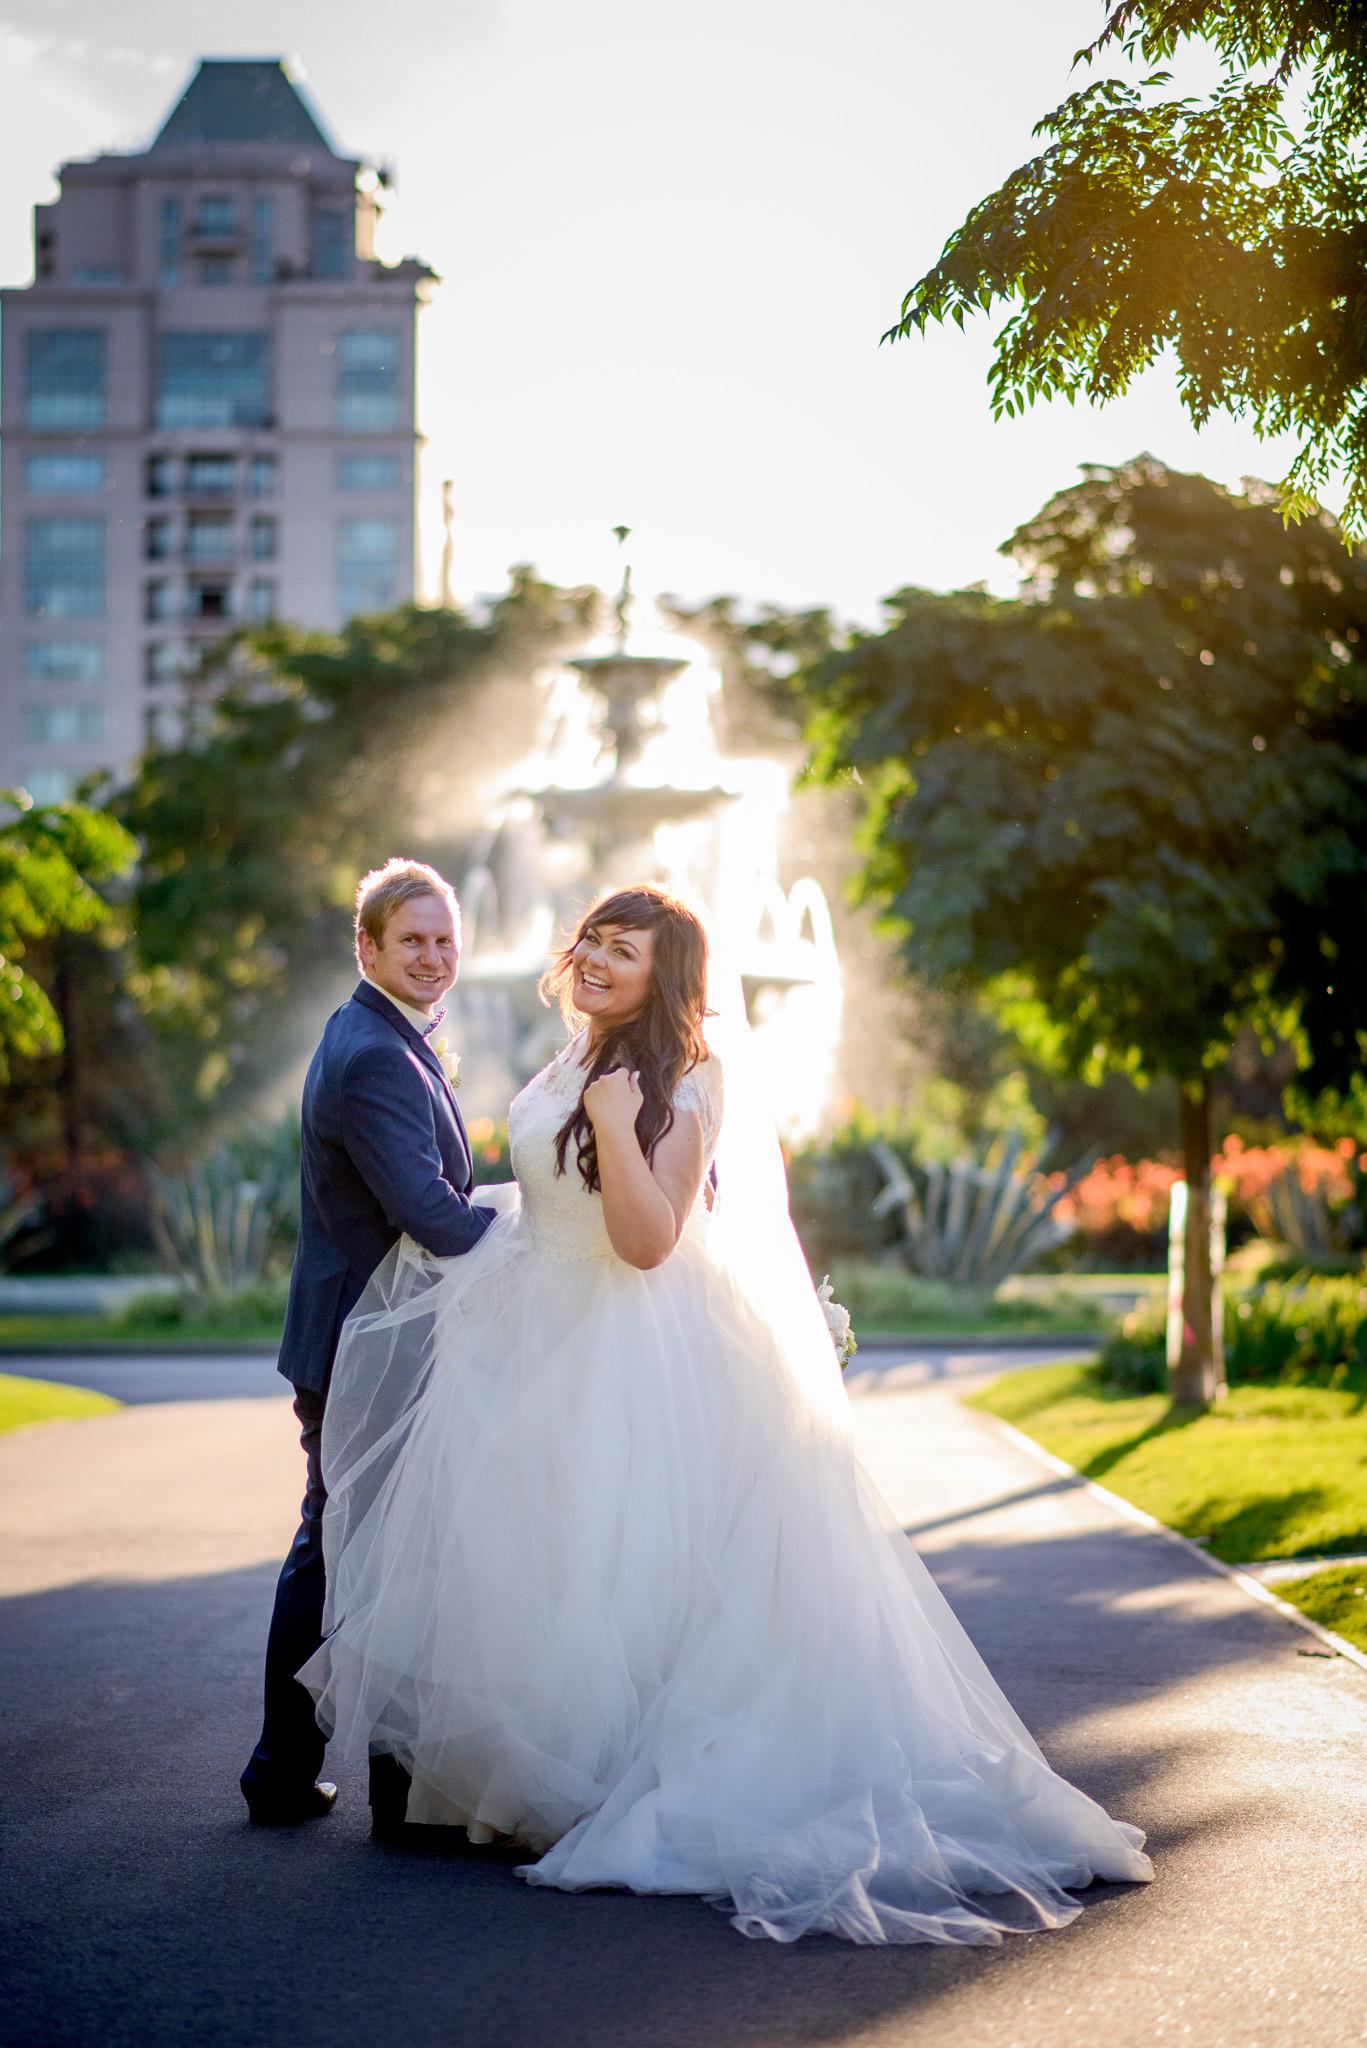 Greg and Jess Photography Nashville Portrait and Wedding Photographer 16.jpg